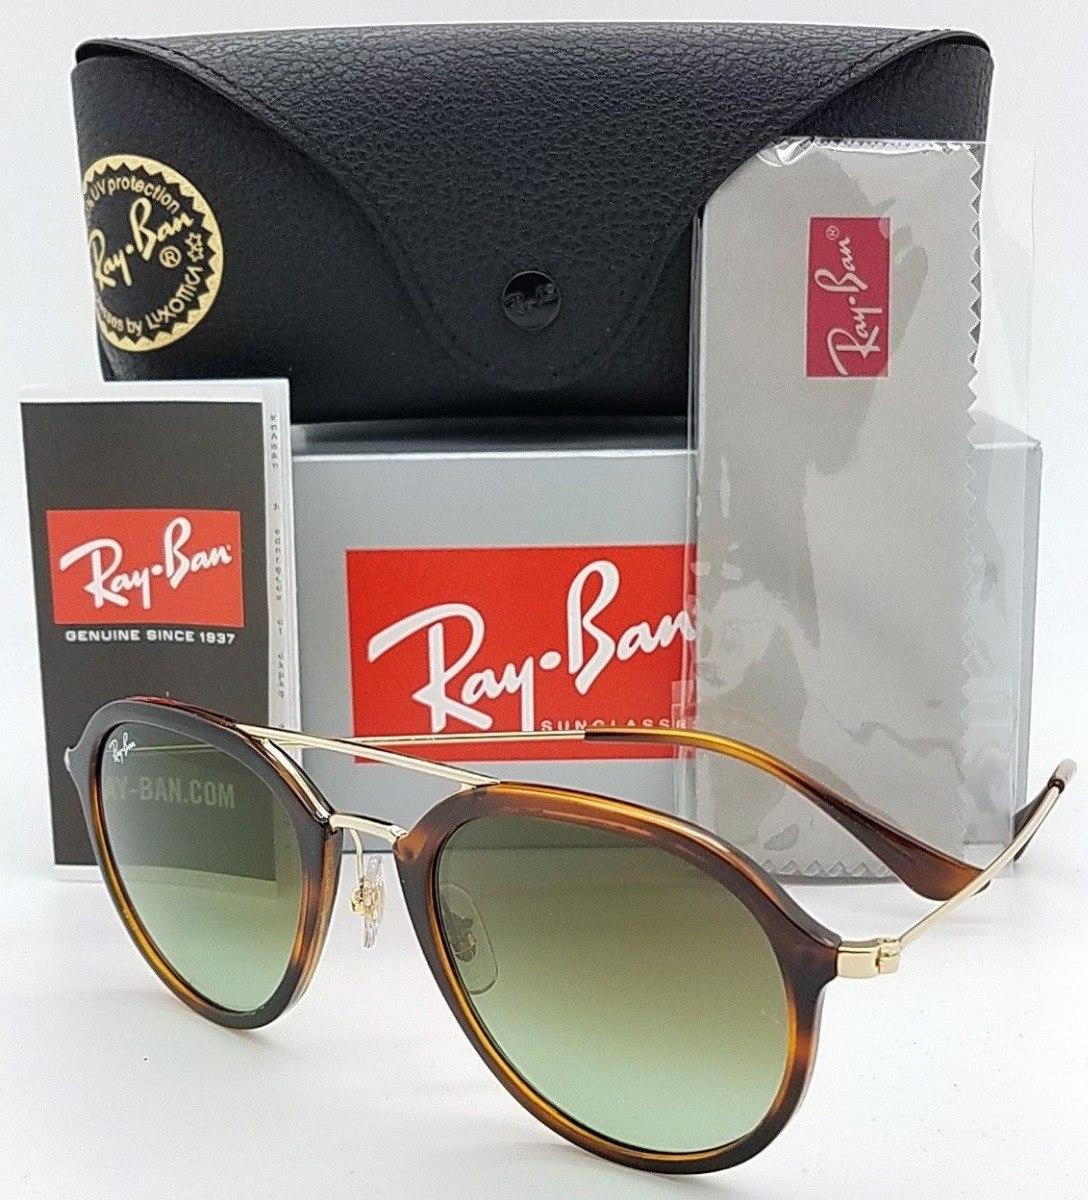 387315171f294 Oculos De Sol Ray Ban Feminino Masculino Rb4253 Tartaruga - R  178 ...